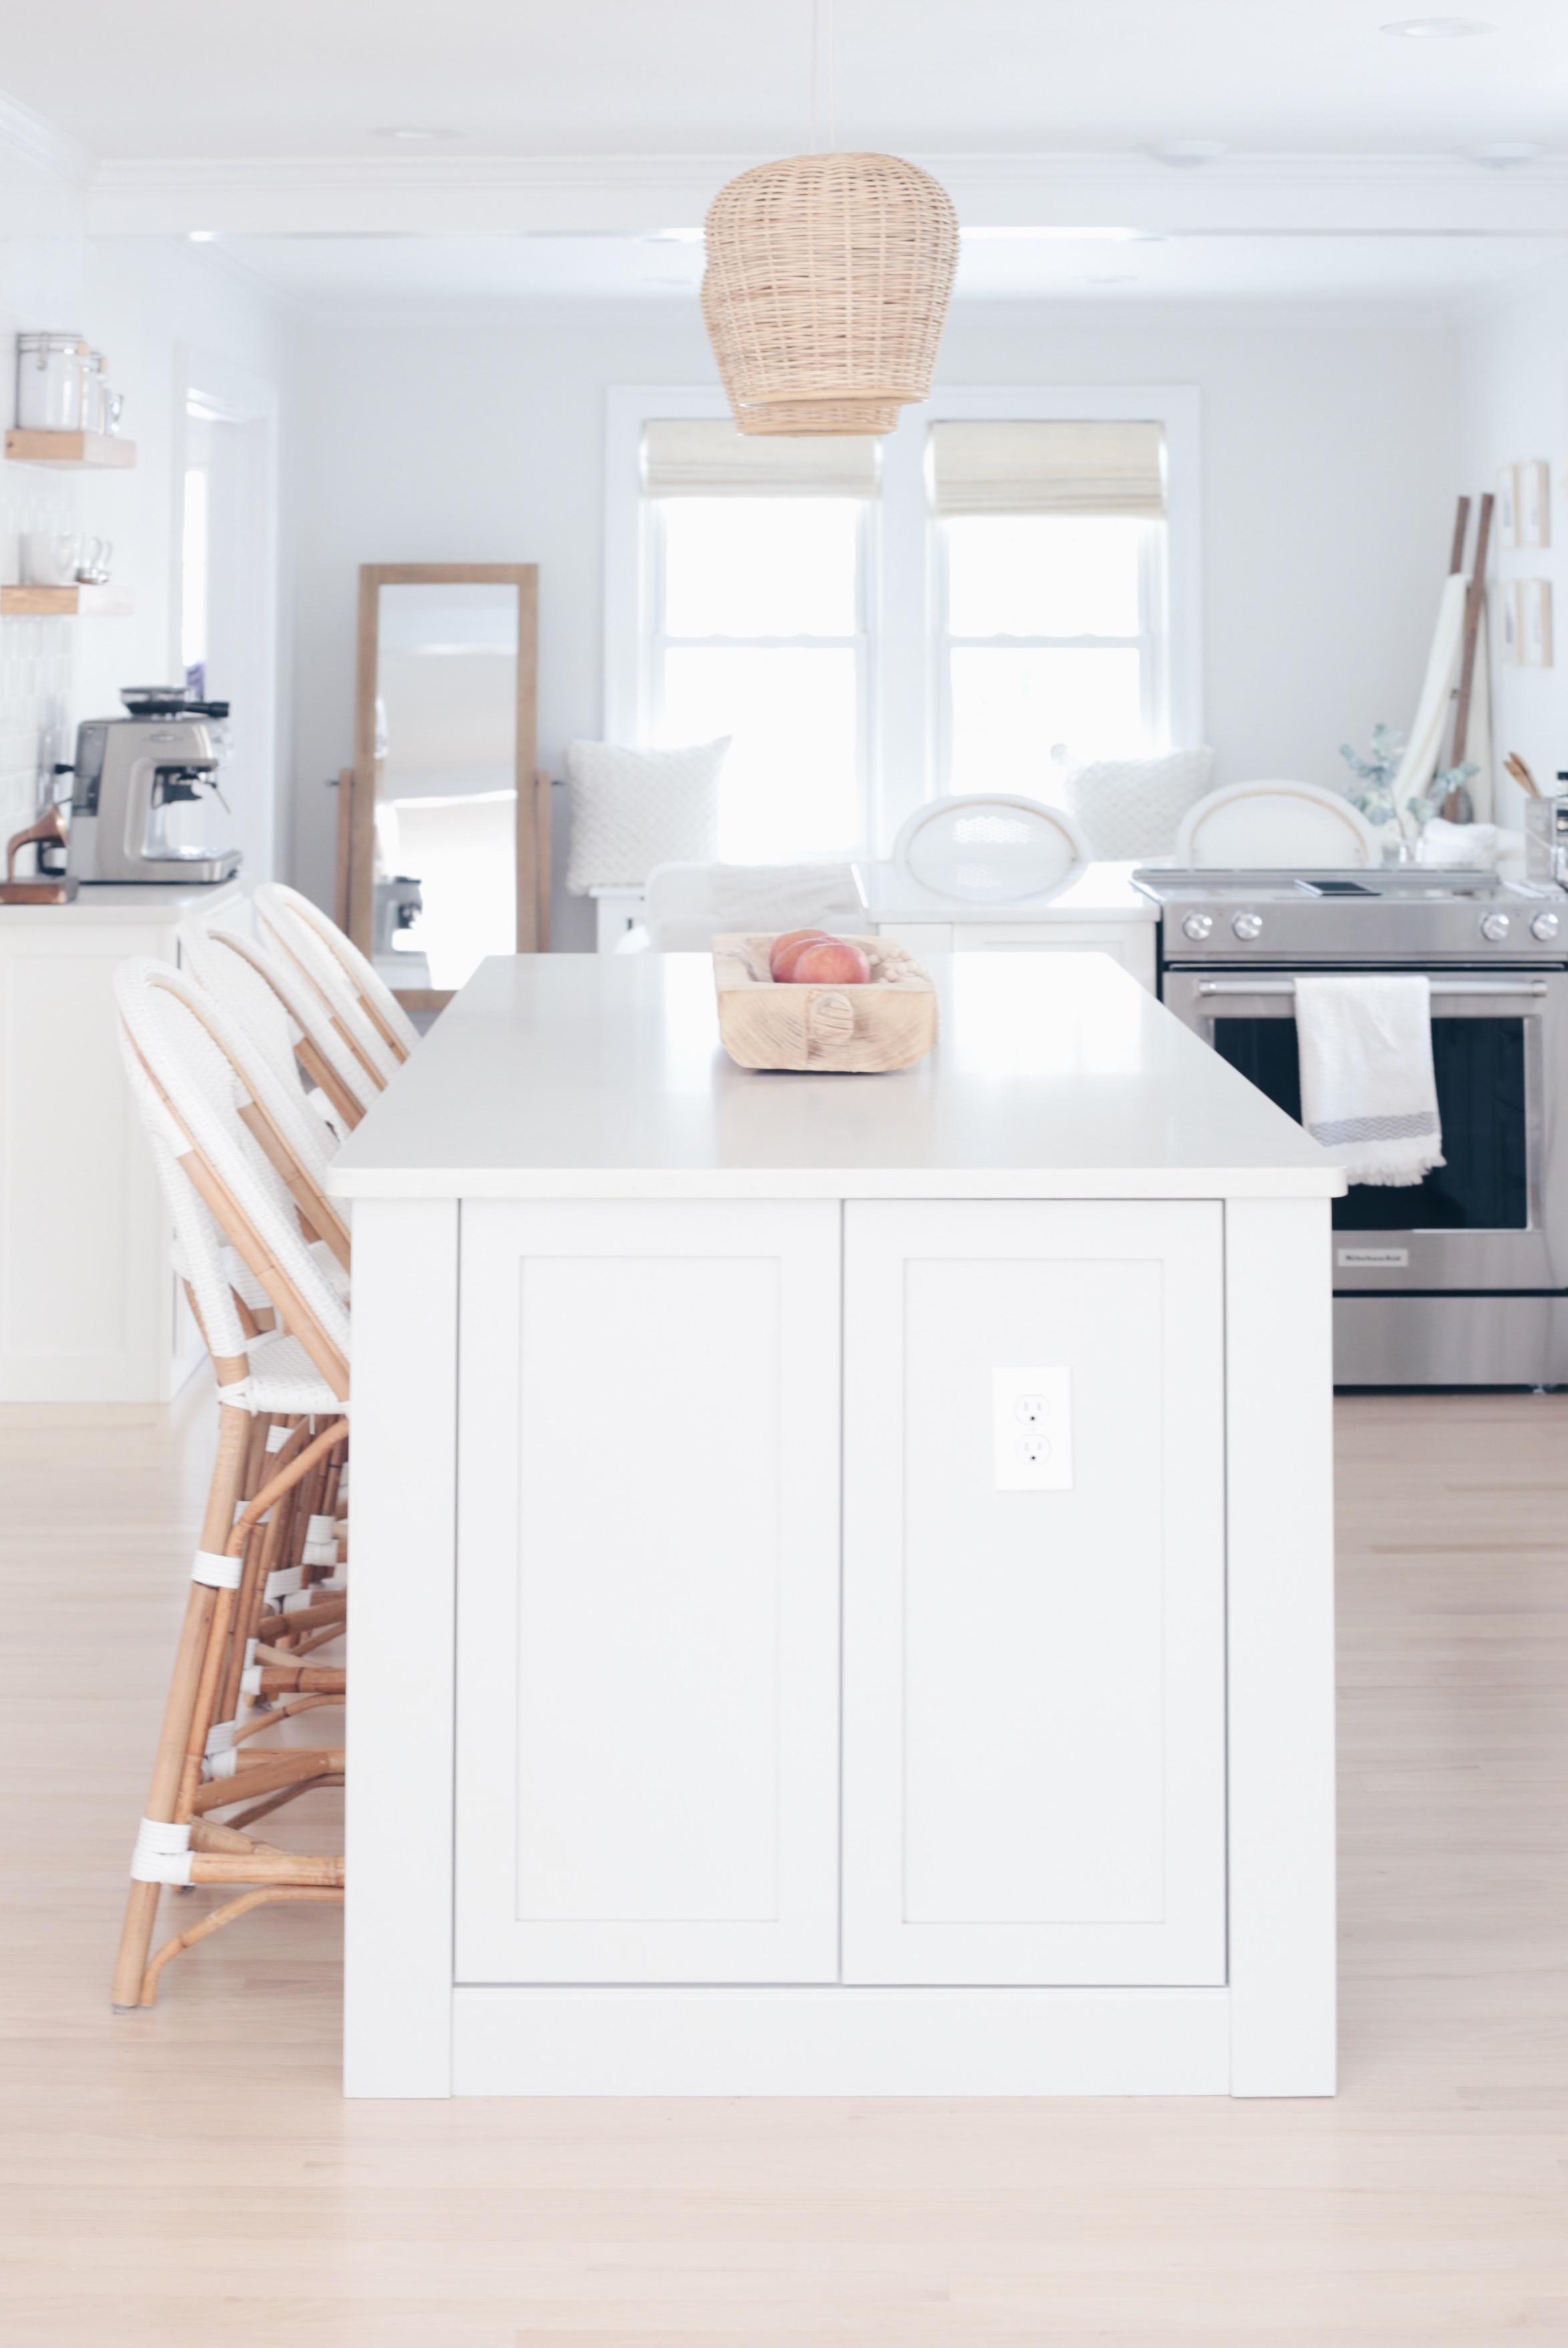 MUST READ - Number 1 tip when planning a kitchen renovation - coastal kitchen island